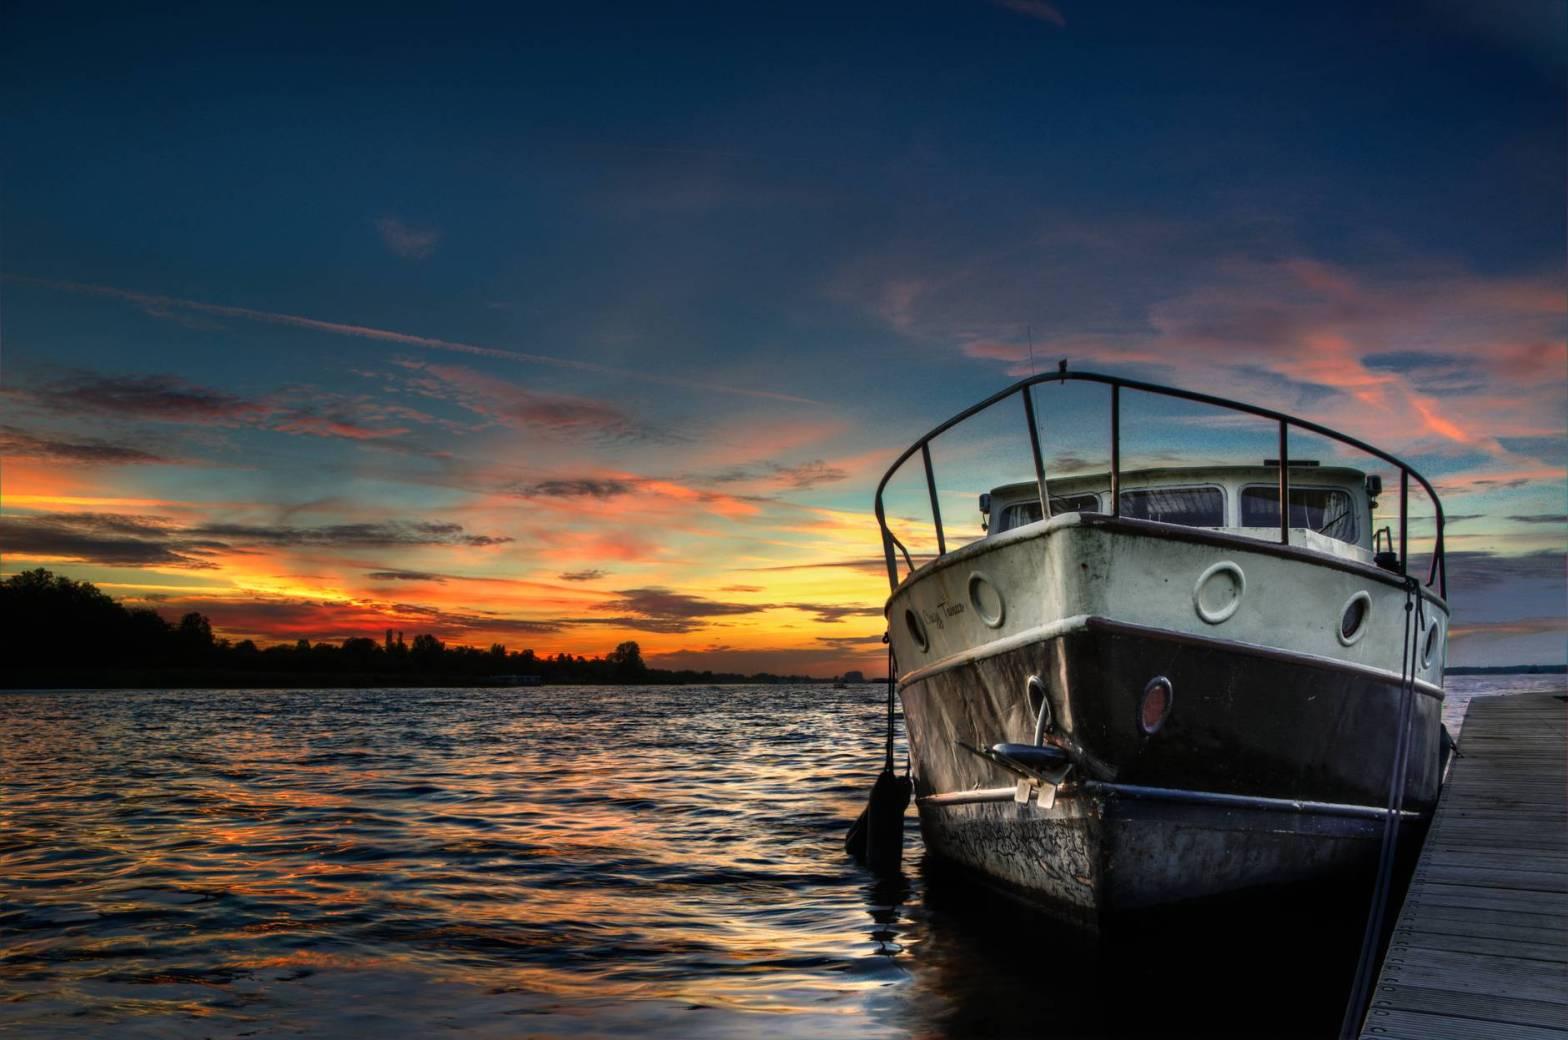 sunset boat lake hdr